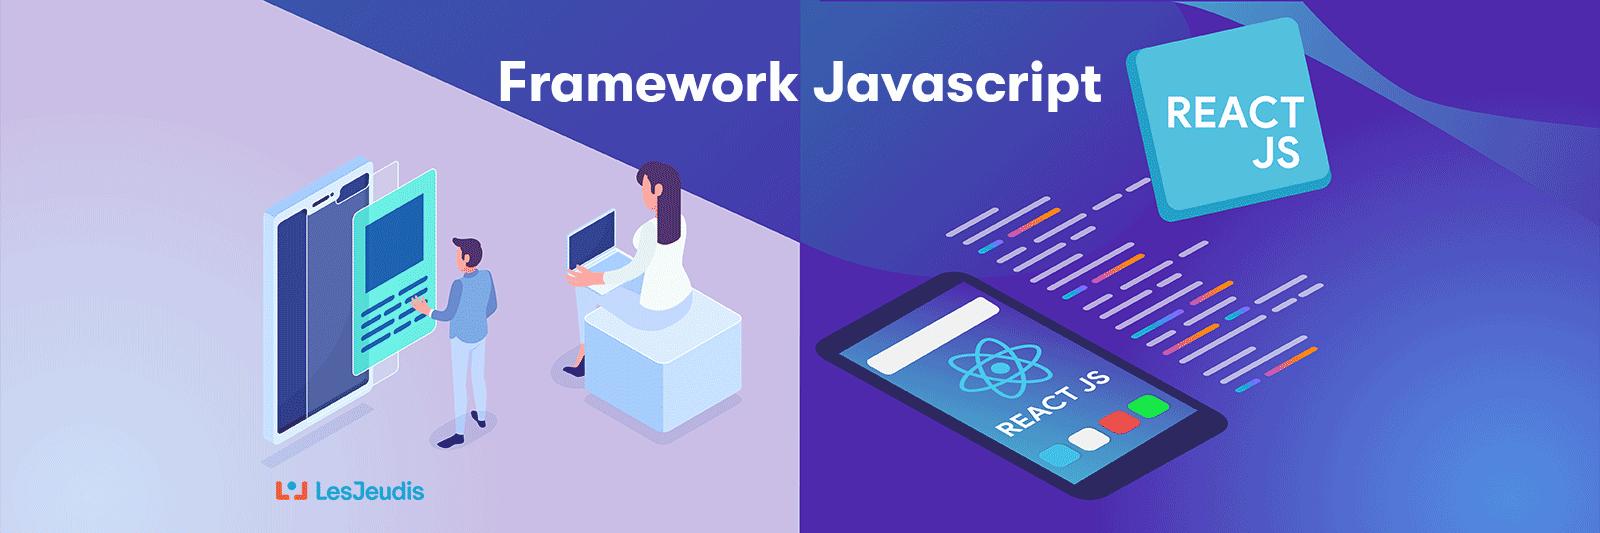 Comment bien utiliser le framework React JS